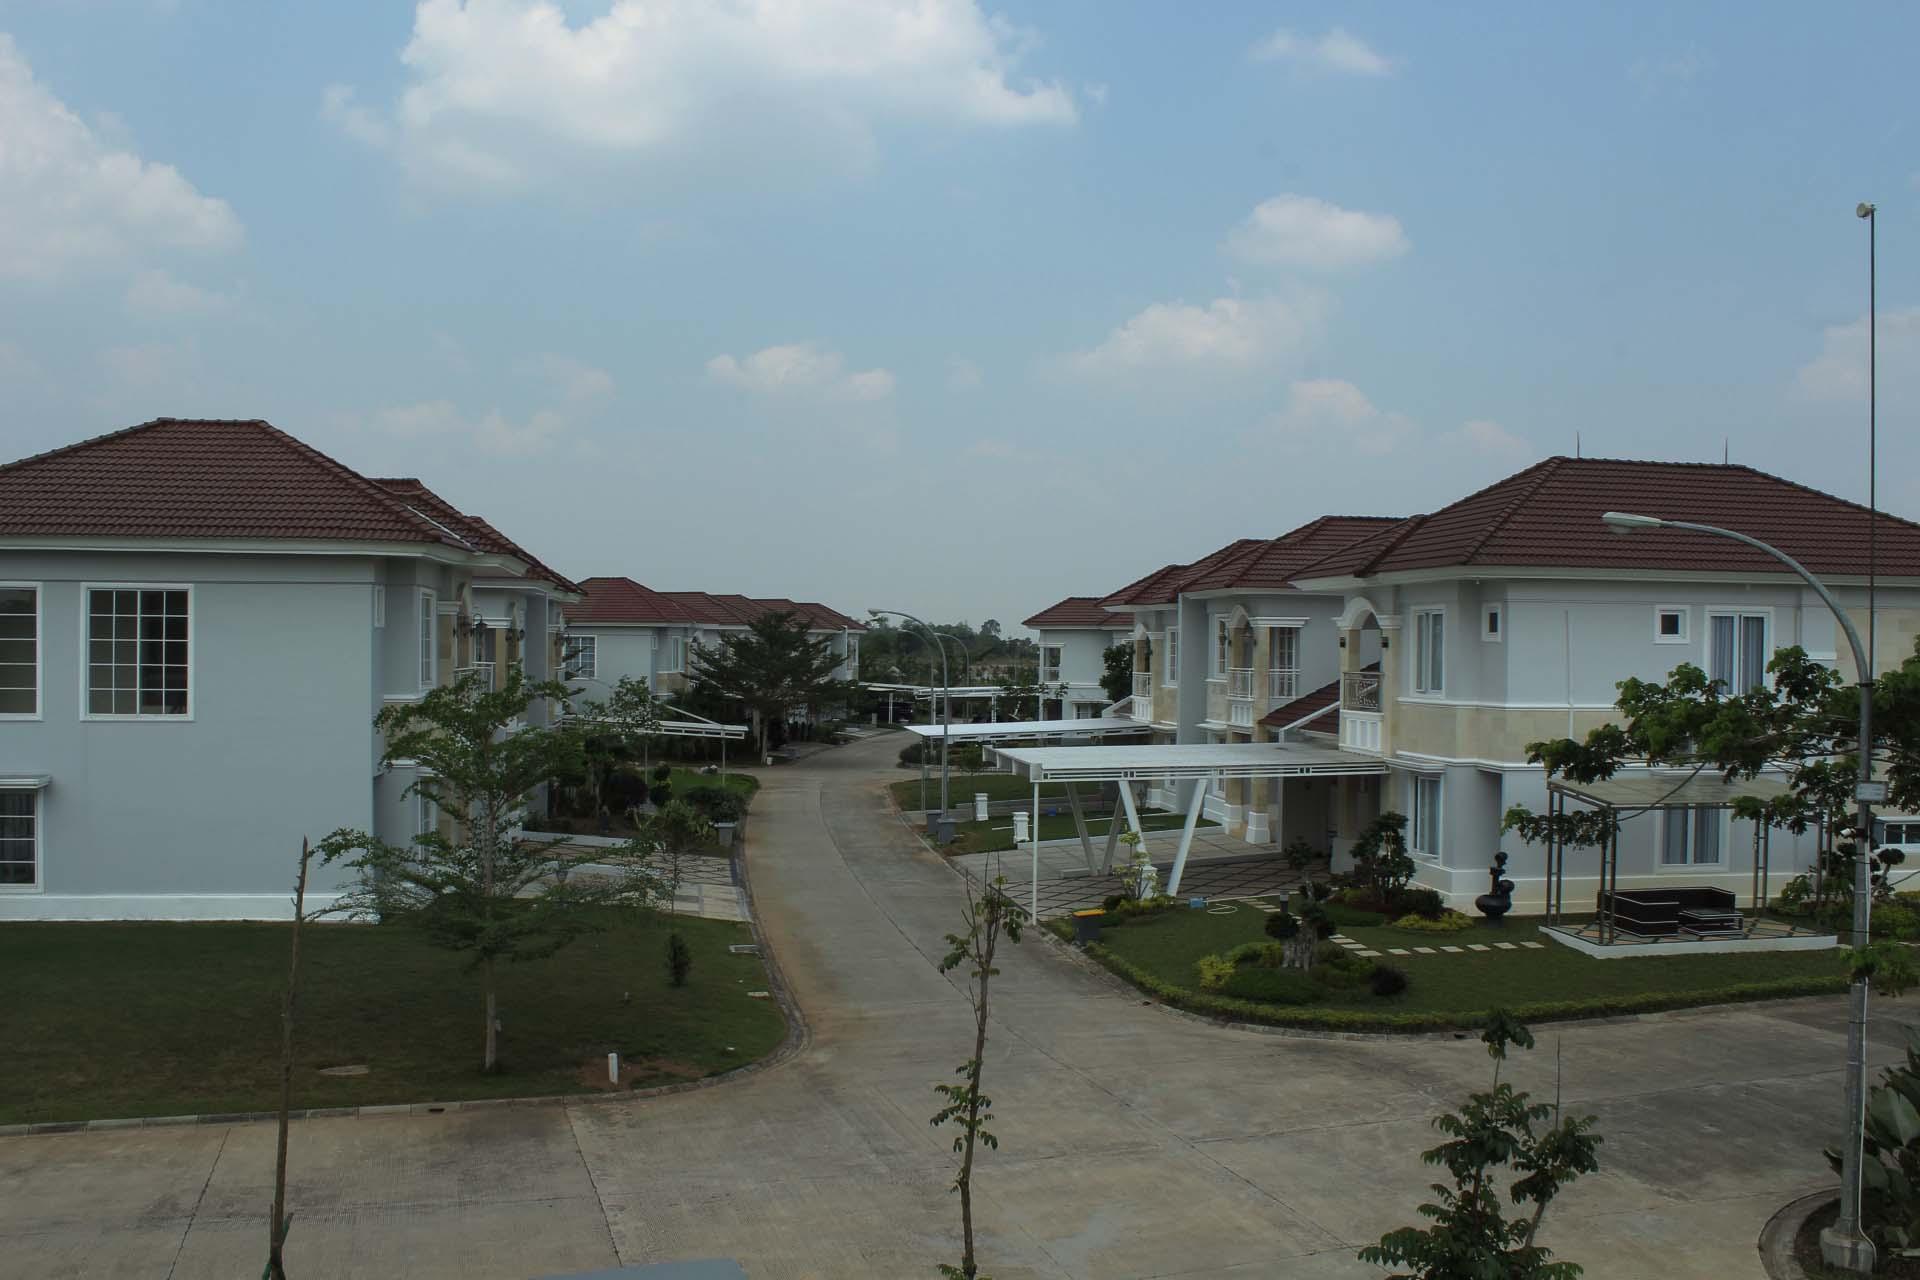 Kota terpadu pertama dengan kawasan terluas di Palembang adalah CitraGrand City (CGC) Palembang yang dikembangkan oleh Ciputra Group